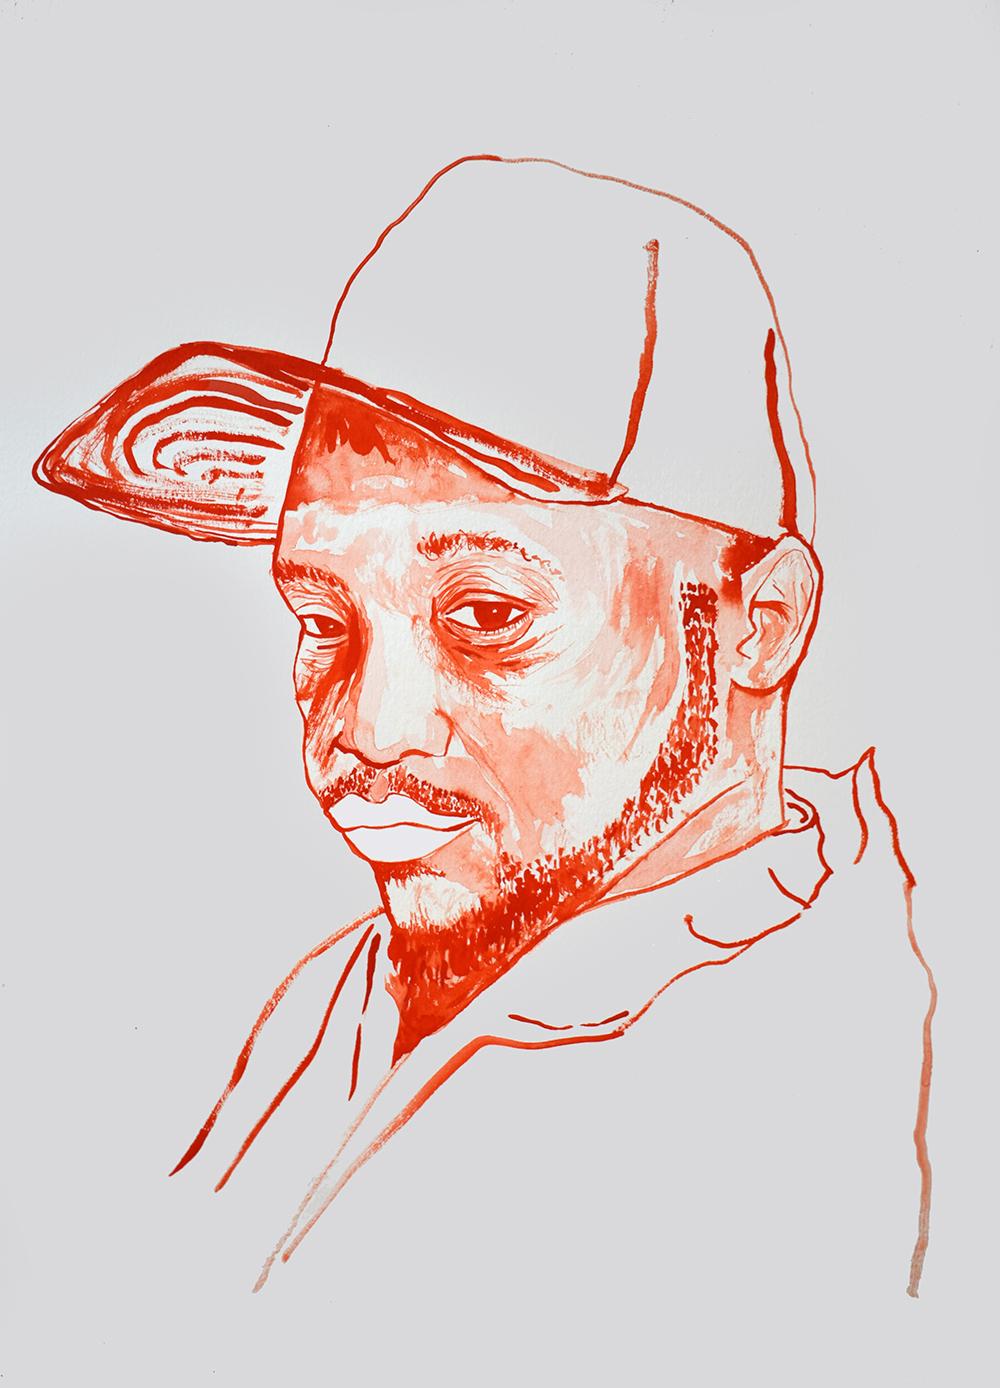 `Kool G Rap', 29.7 x 42.0cm, watercolour on 230g akvarel paper, 2017